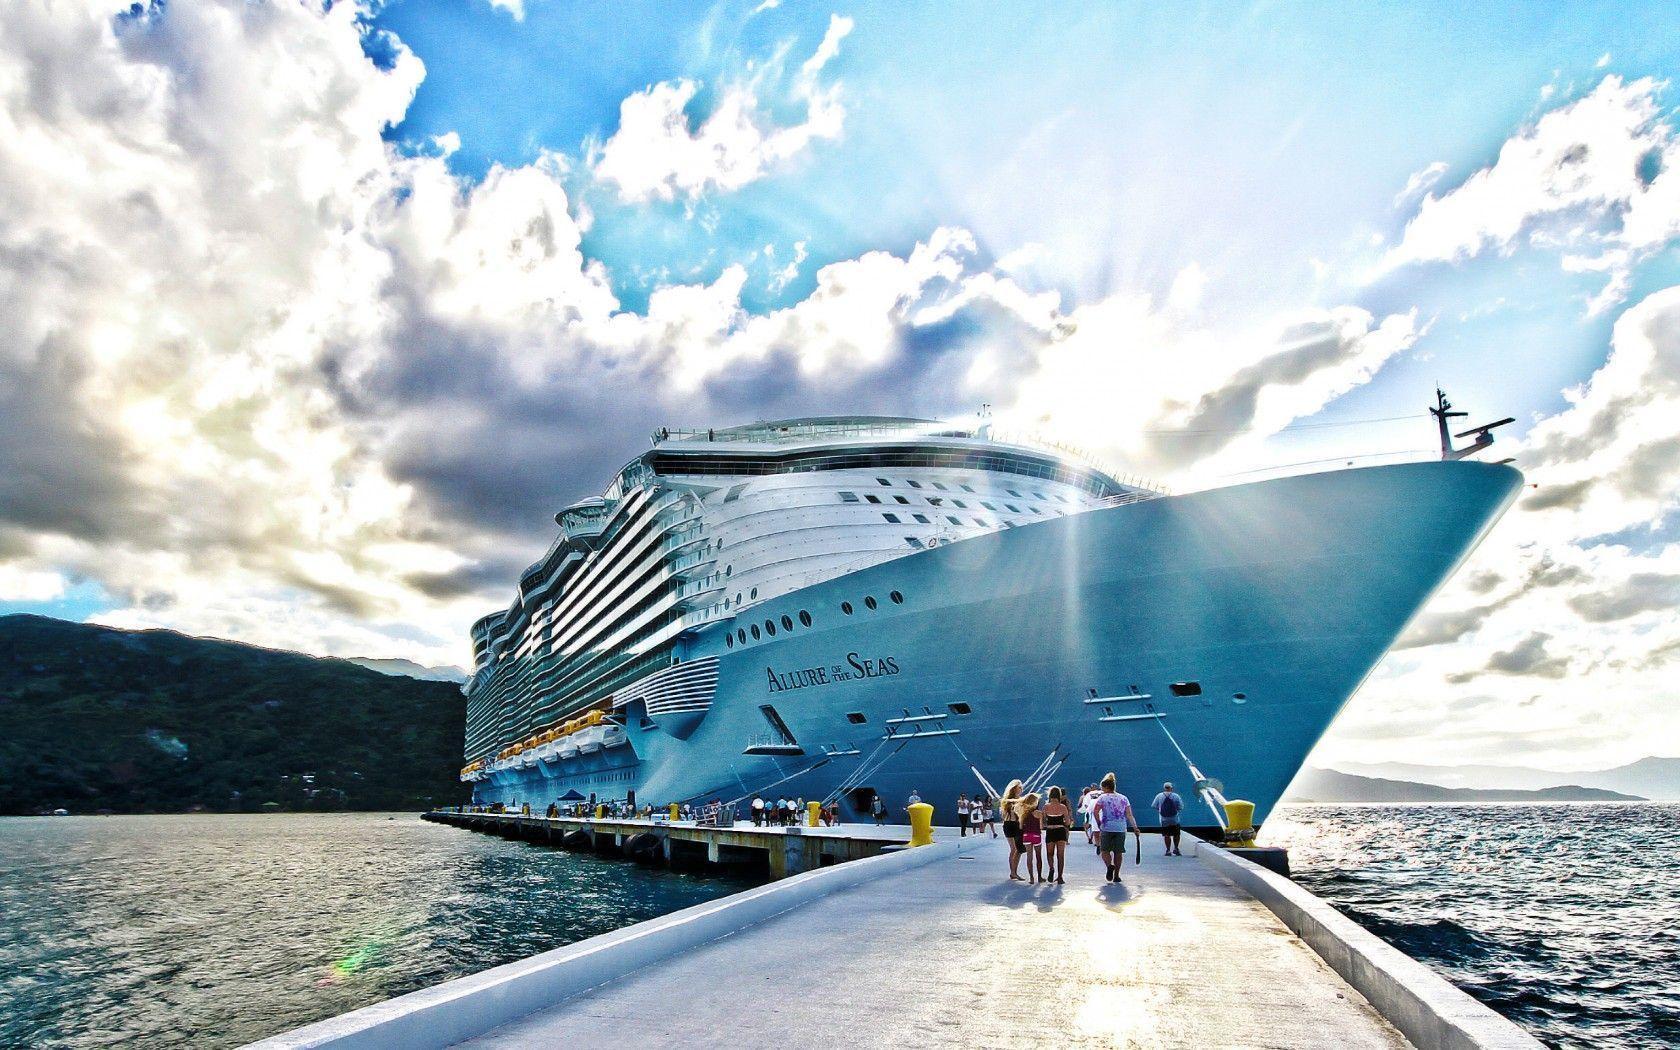 cruise ship wallpaper background - photo #28